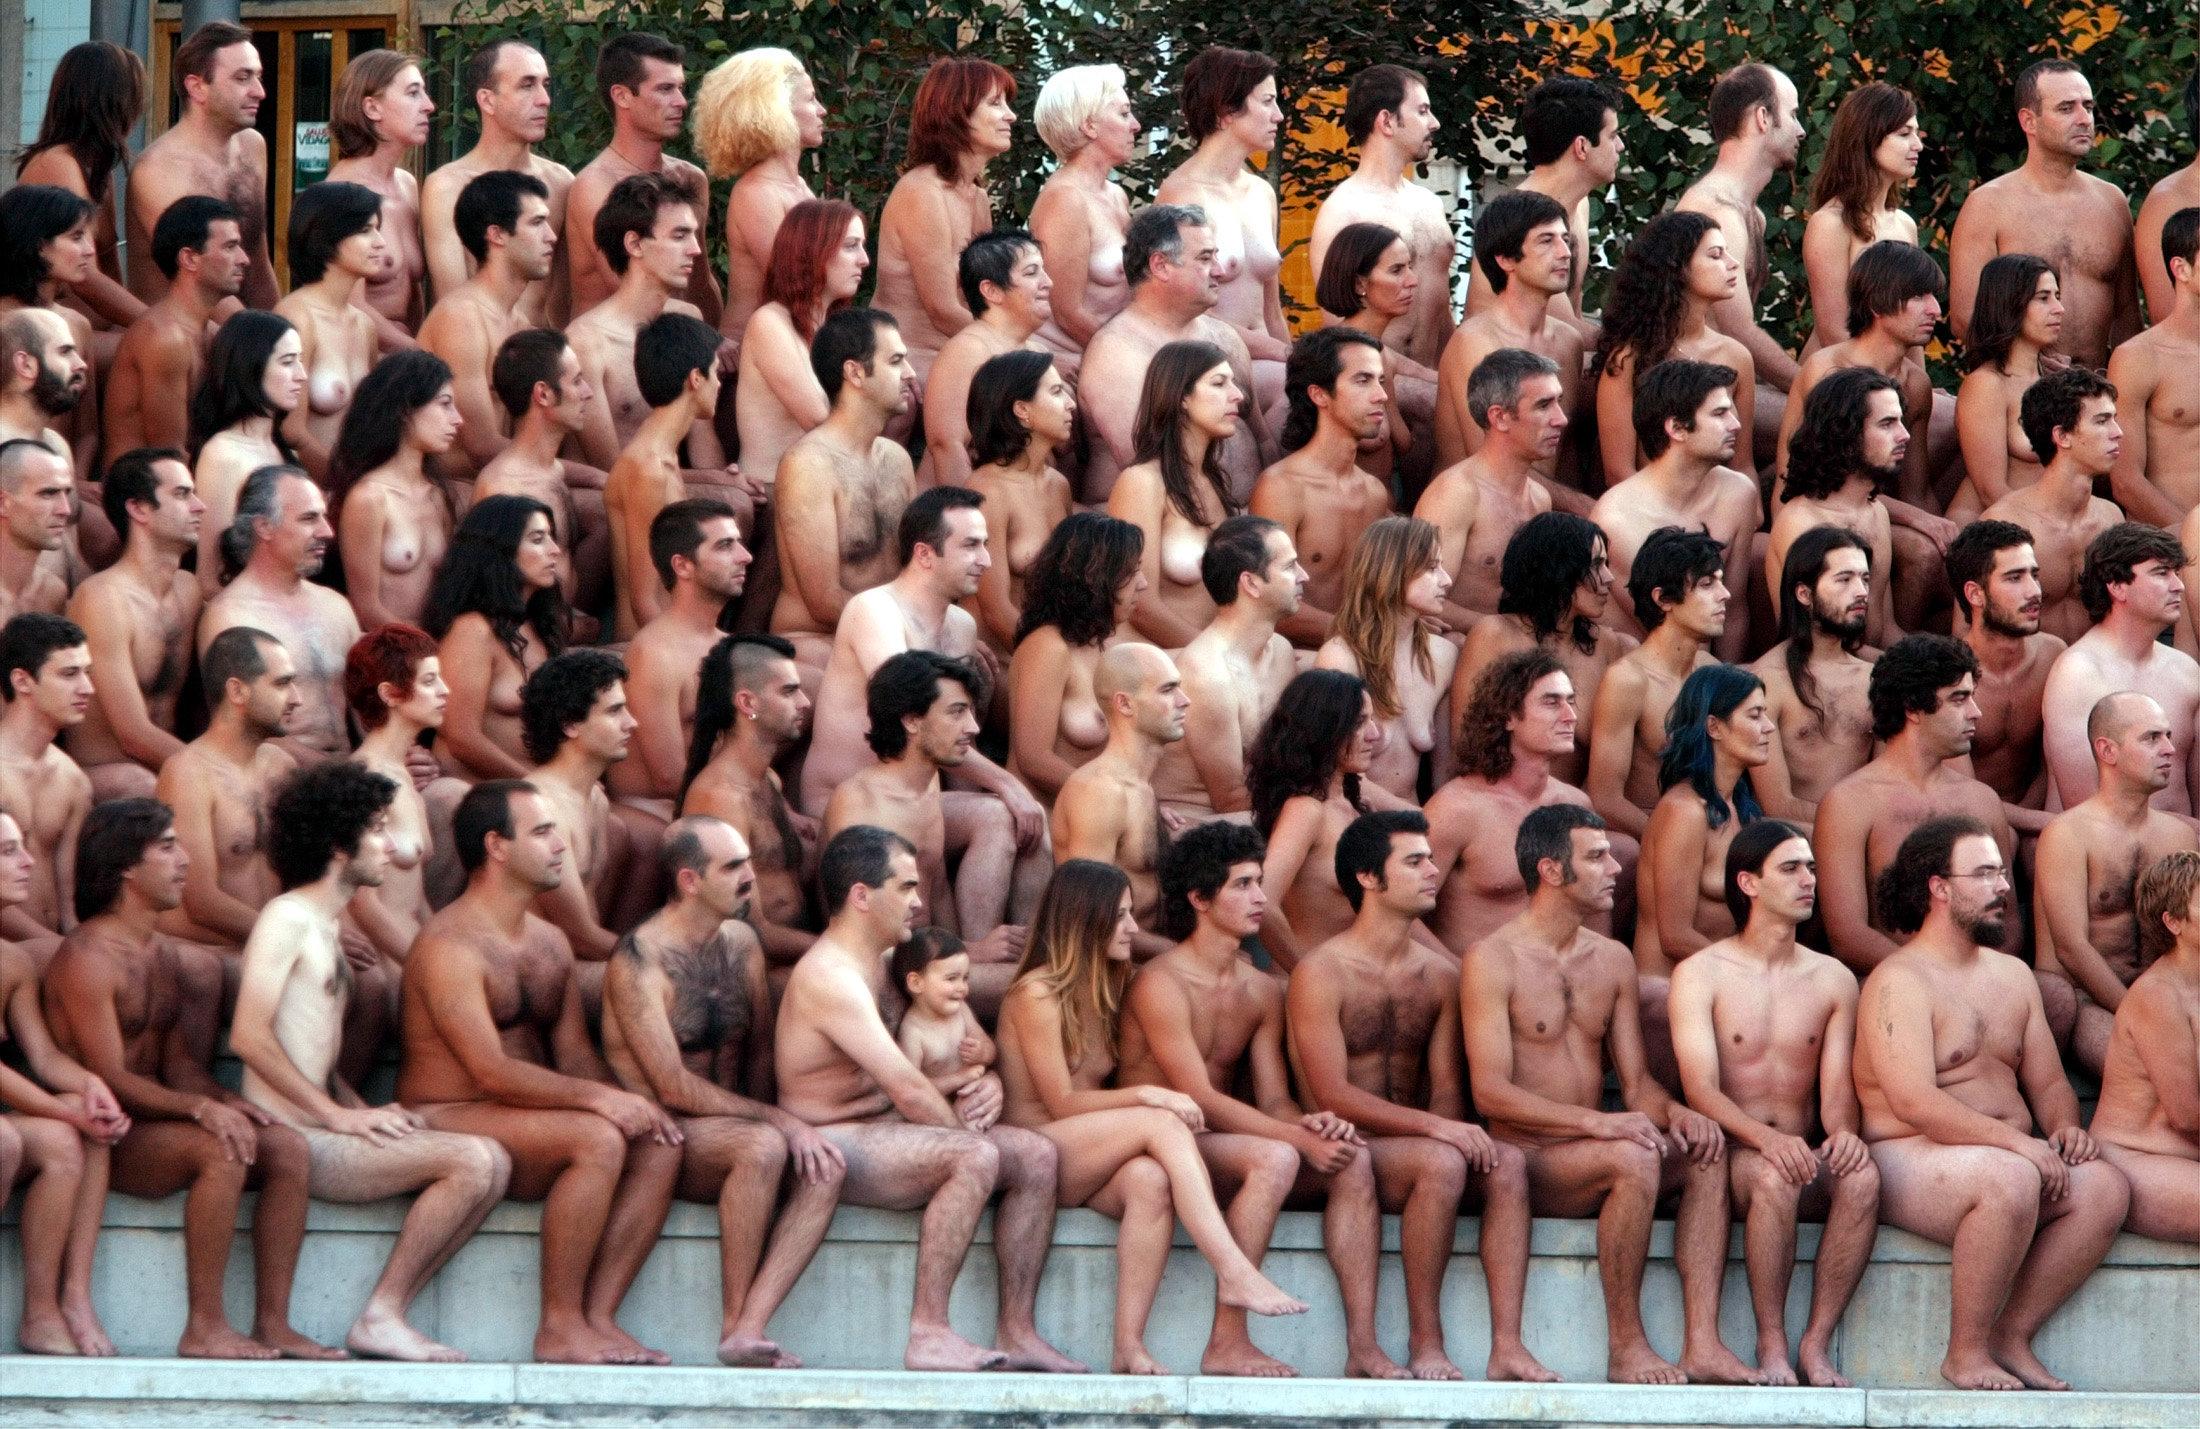 film-group-of-people-nude